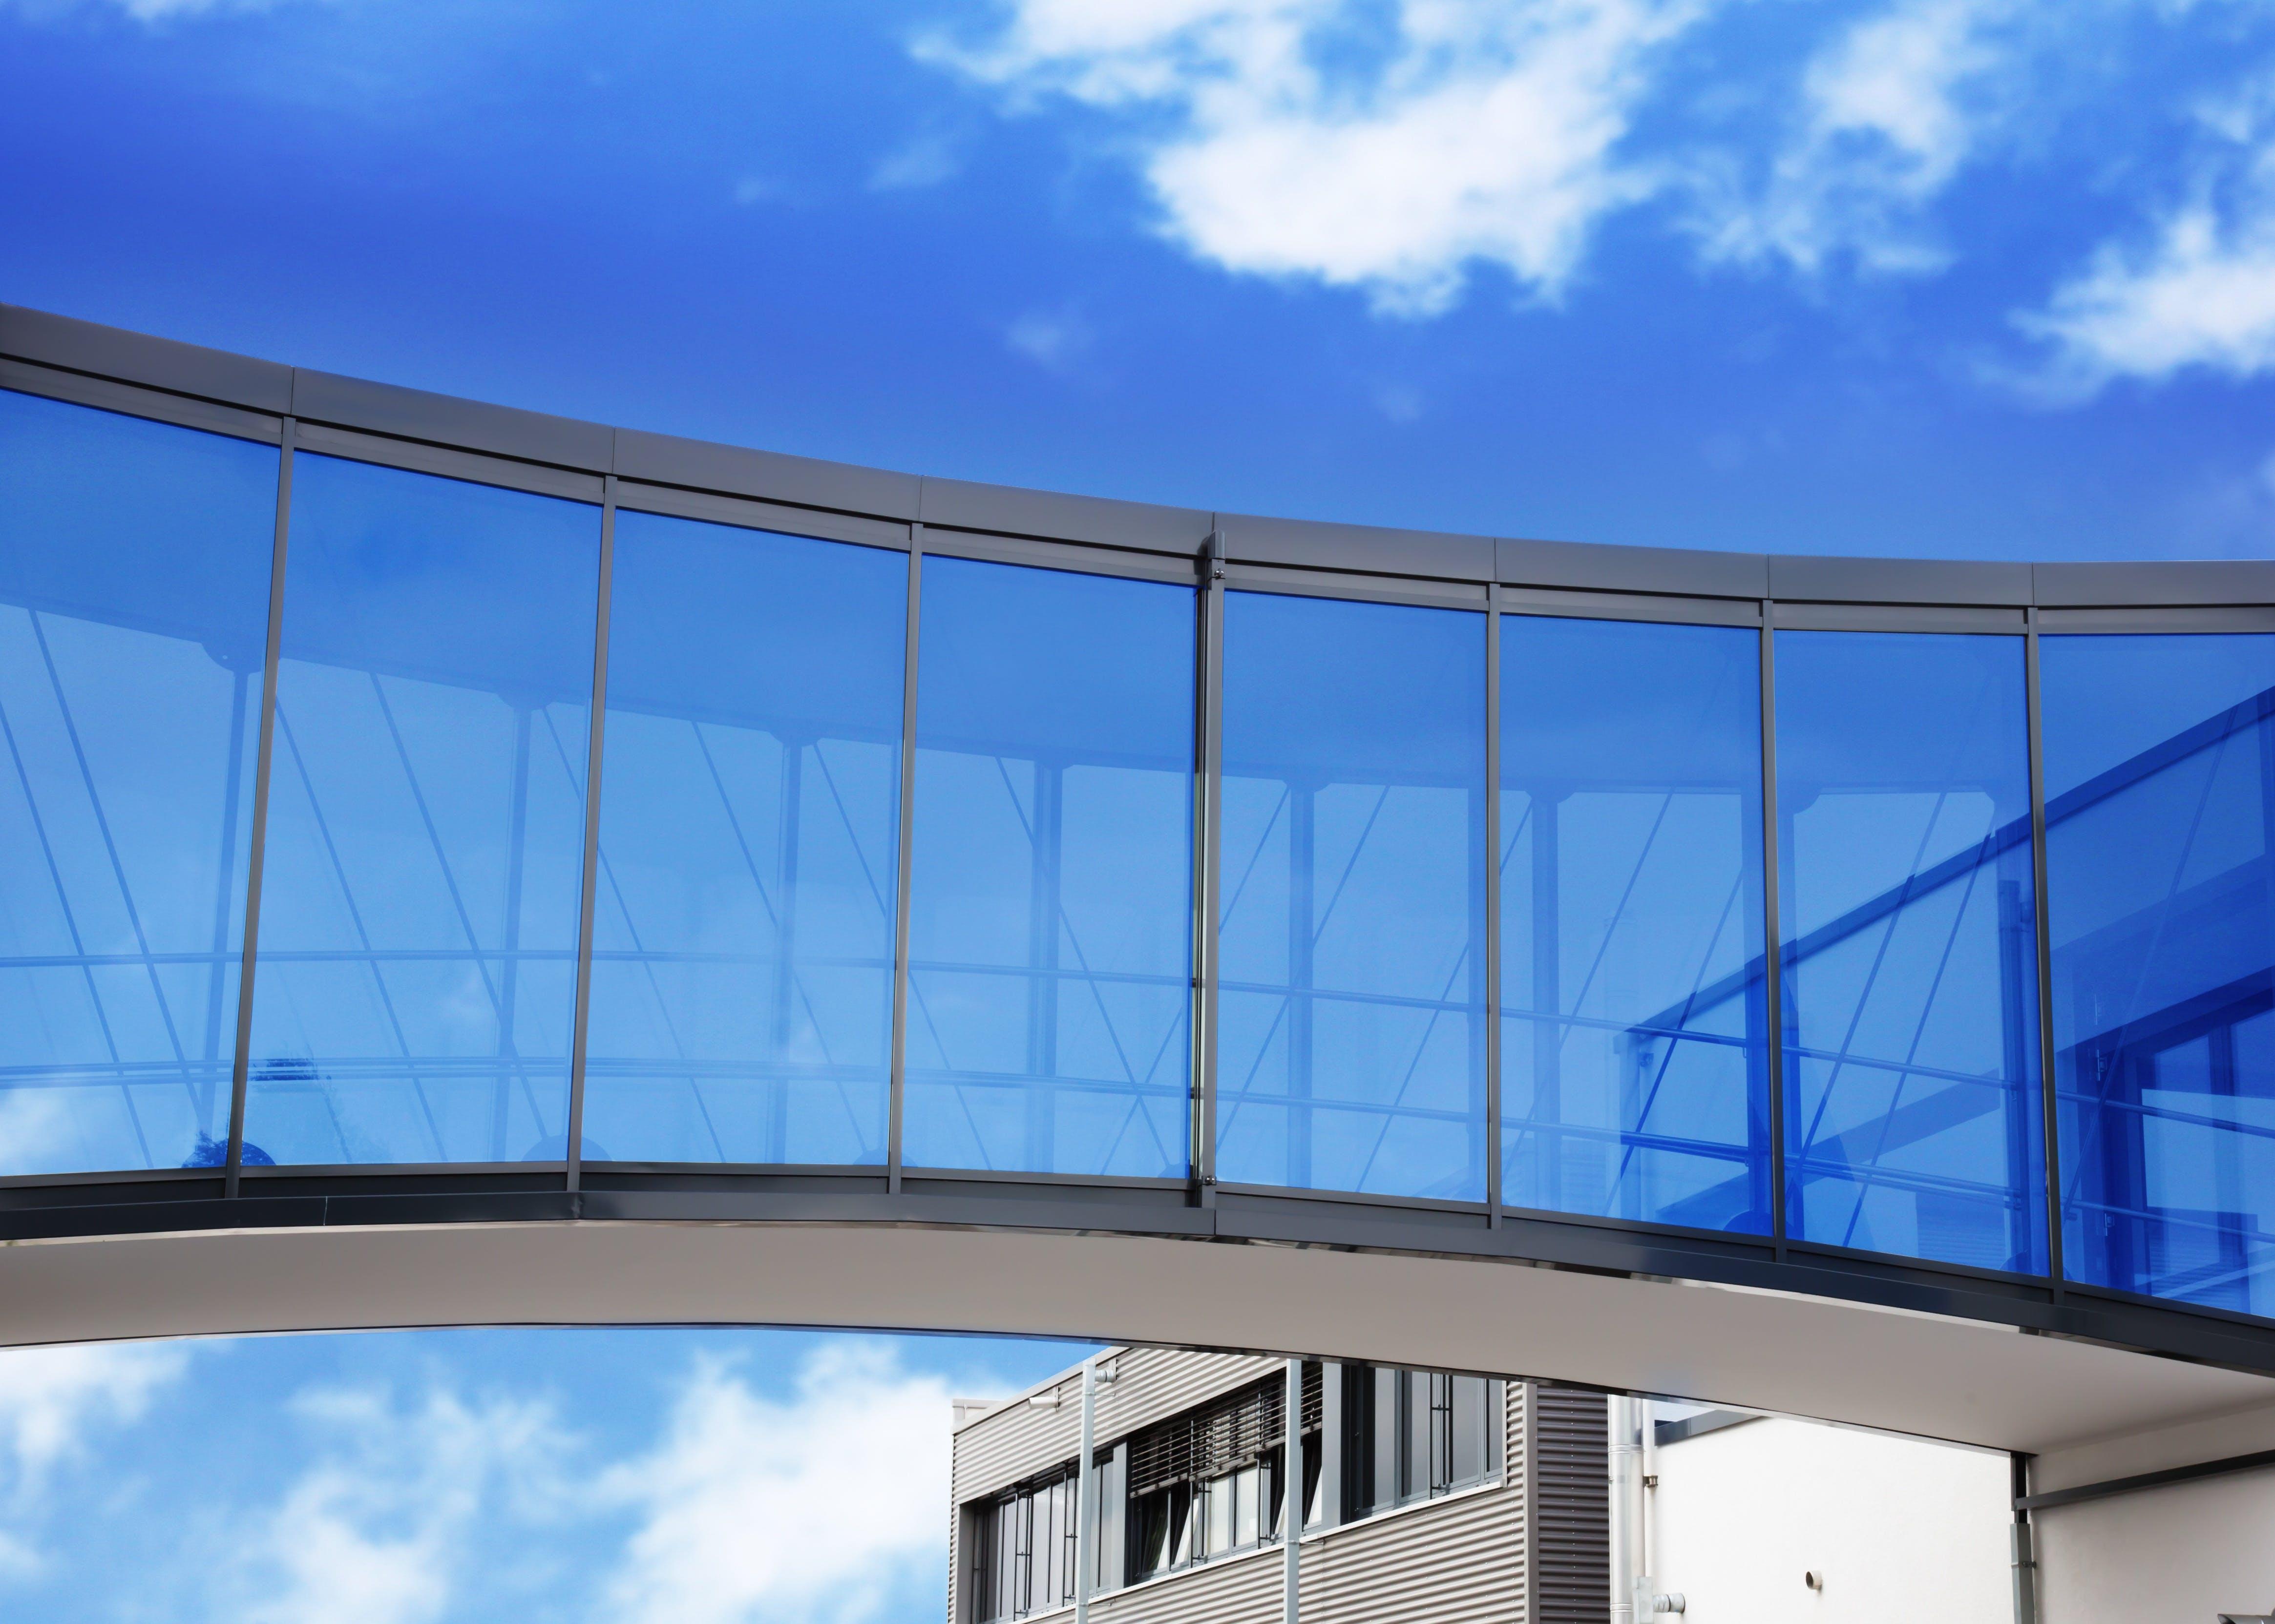 architecture, blue sky, bridge